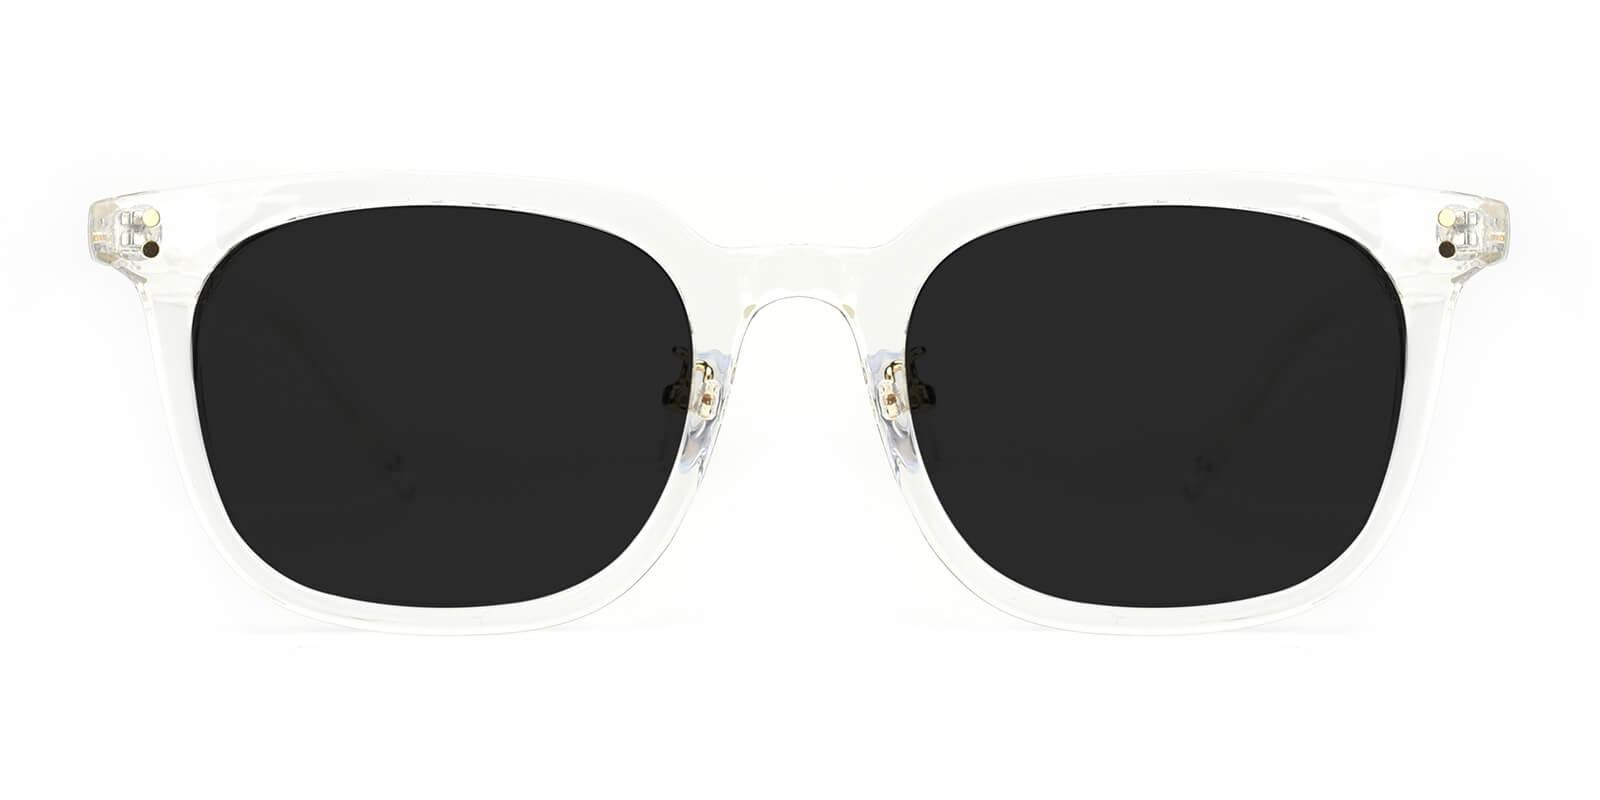 Laya-Translucent-Square-TR-Sunglasses-detail